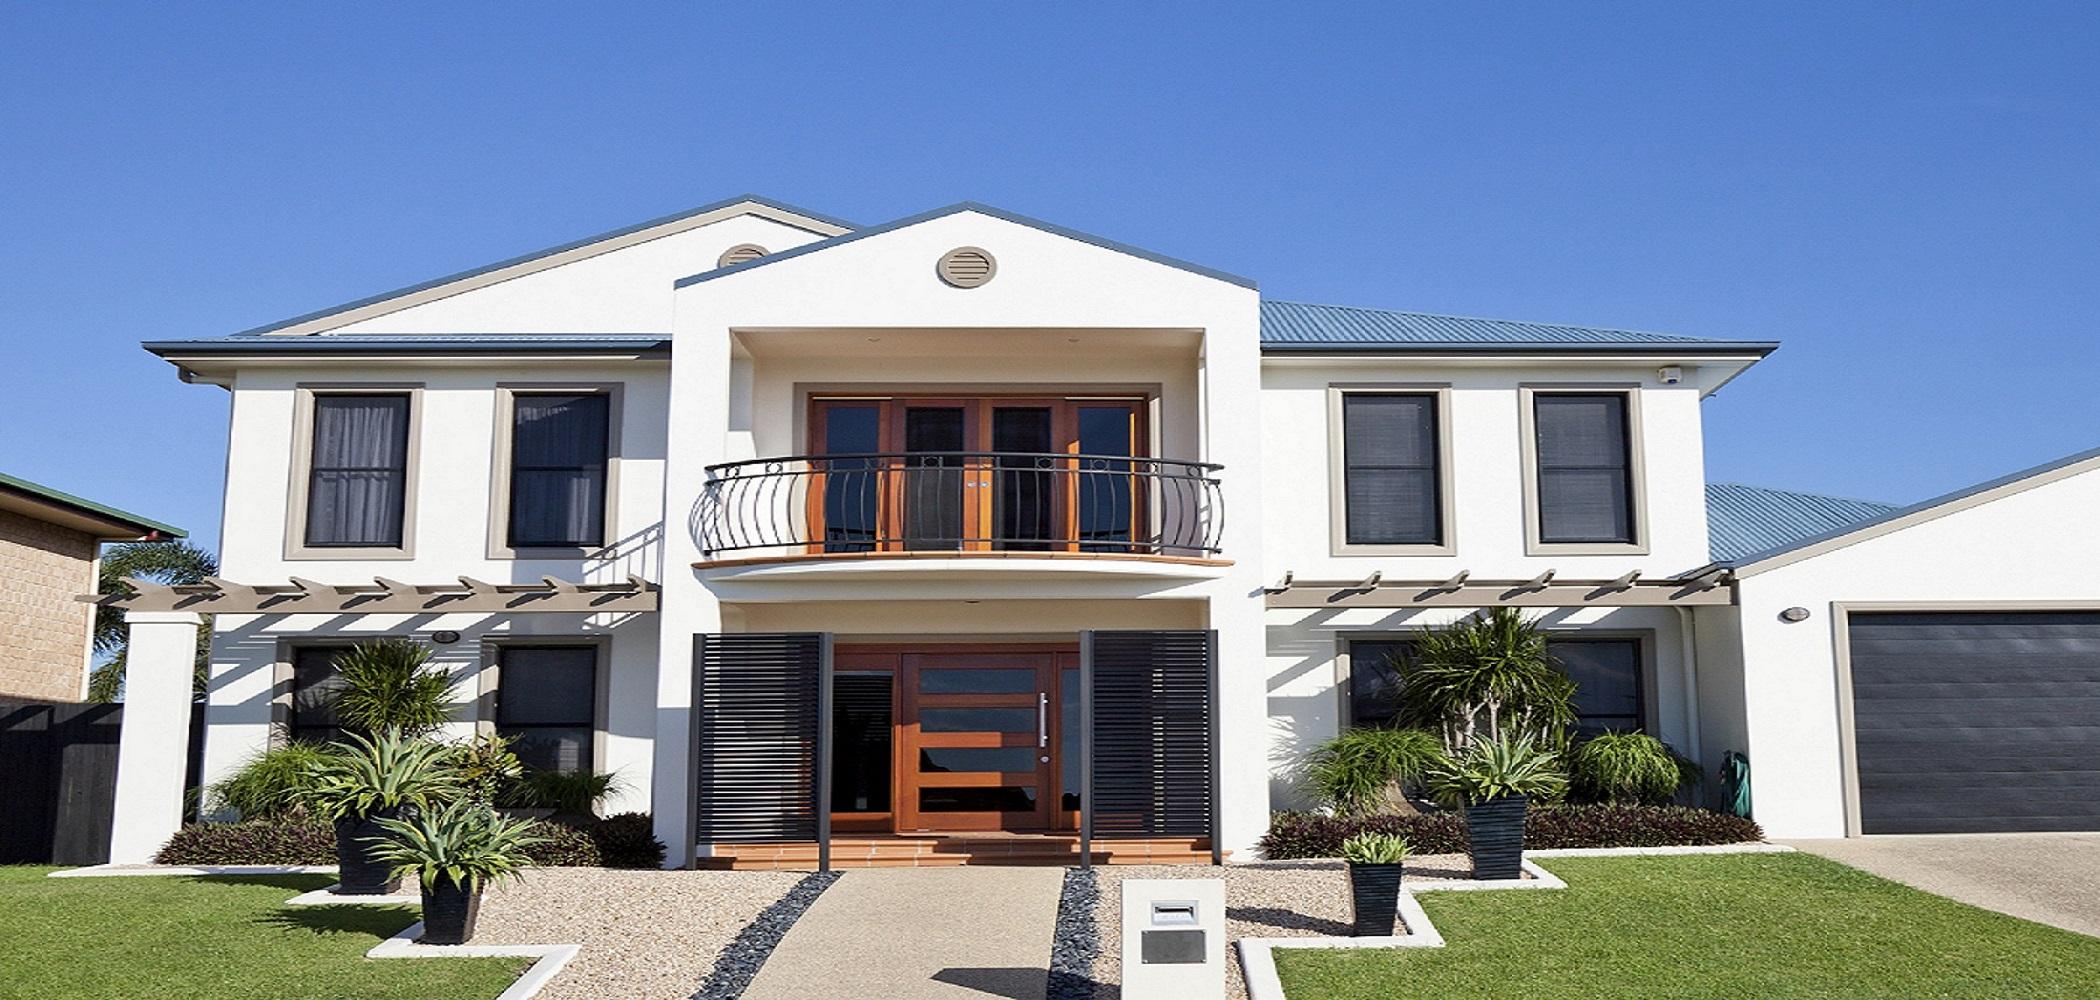 Rio vista real estate for Medium modern house